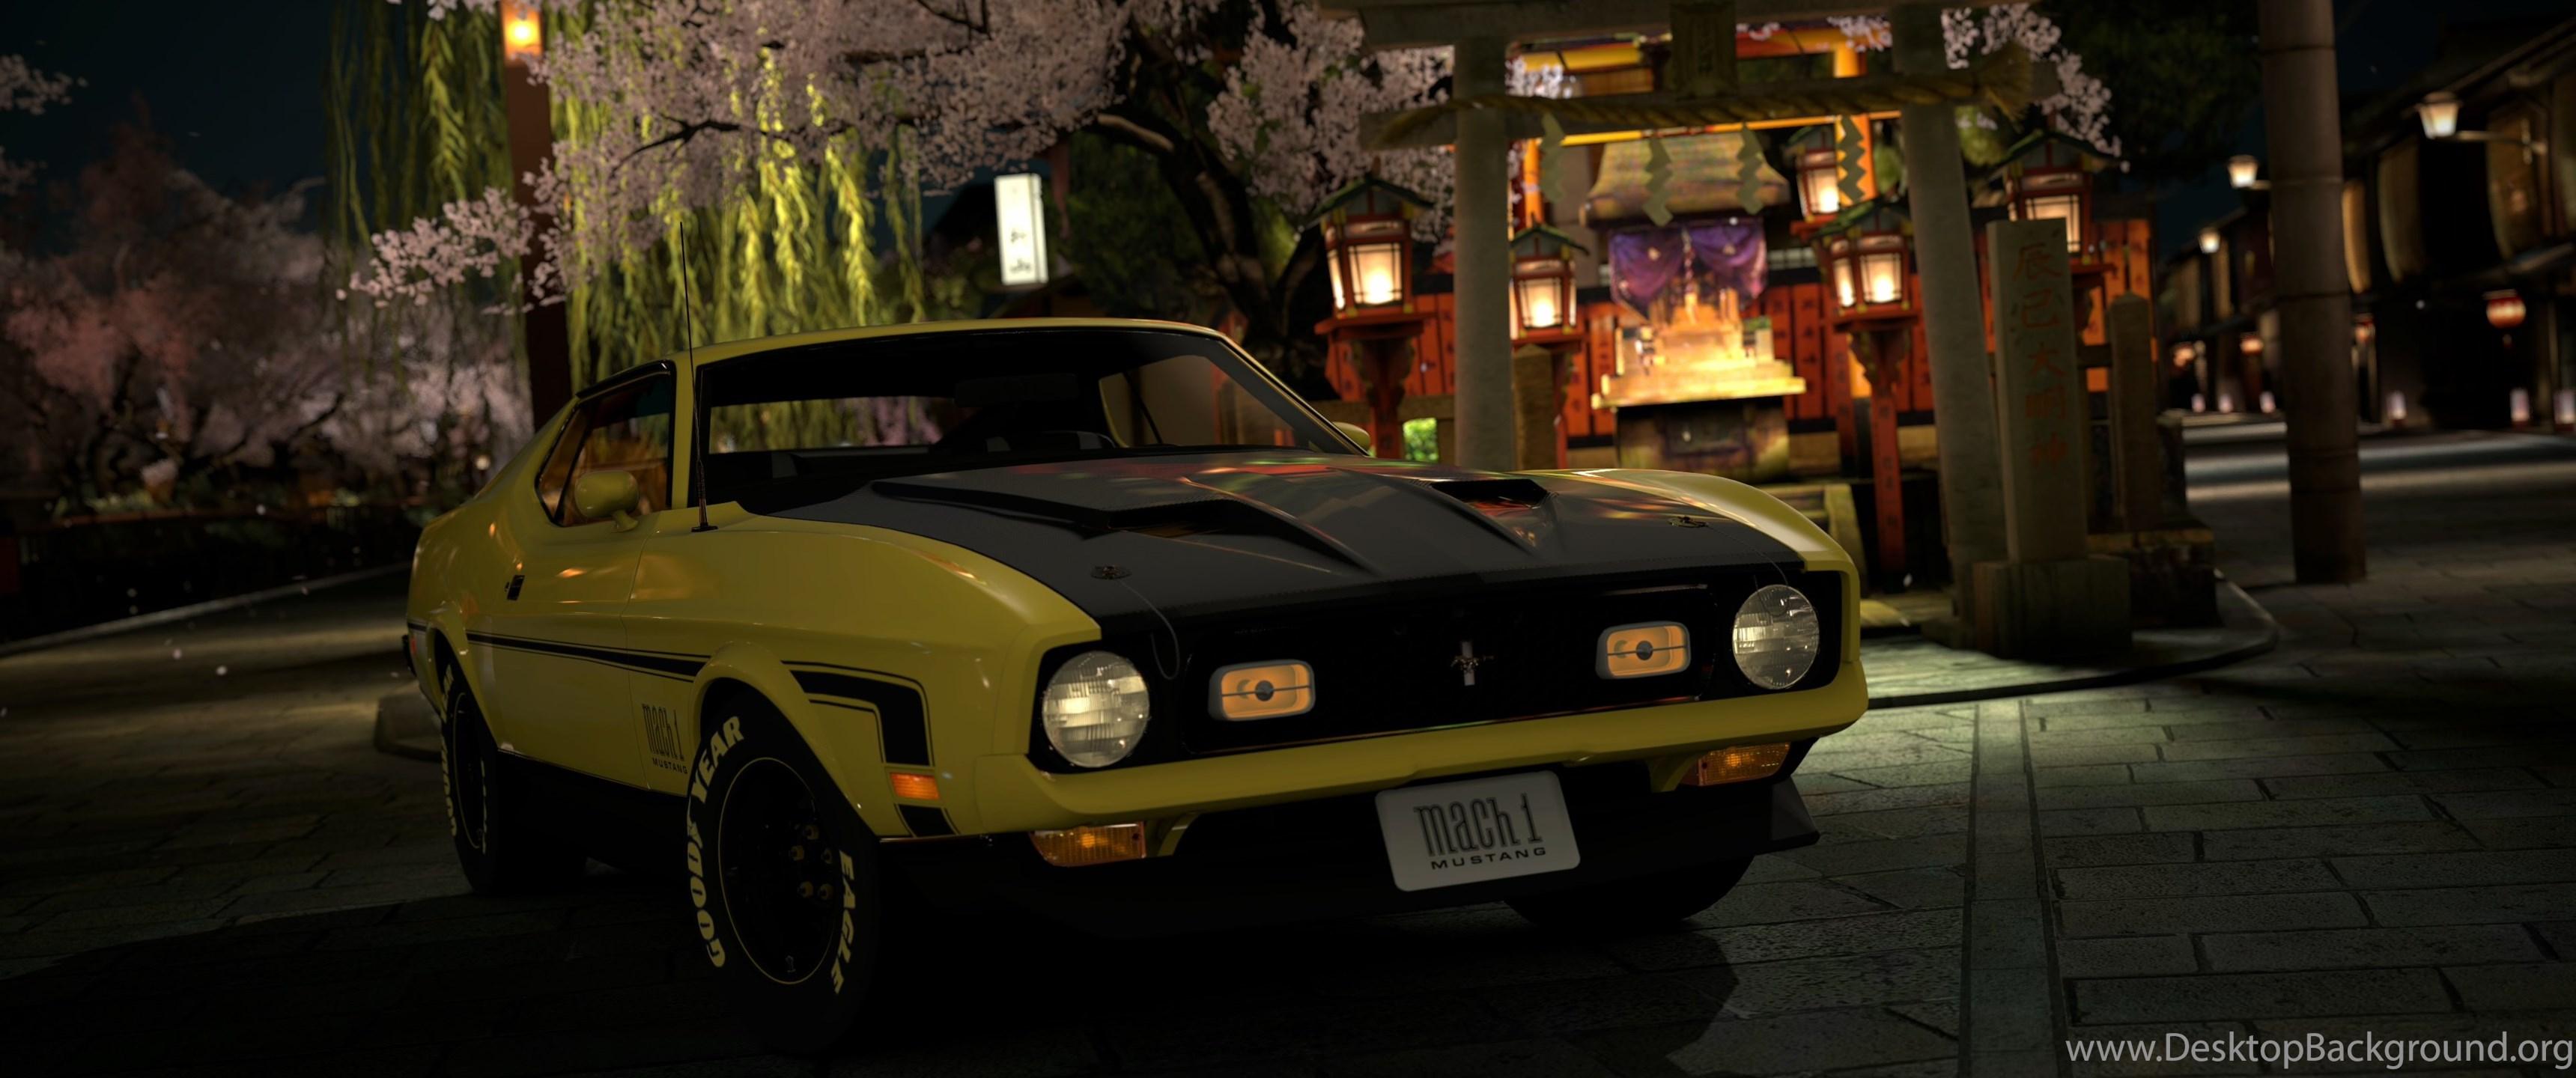 Mustang Ford Muscle Car Classic Car 4k Ultra Hd Astonishing Desktop Background